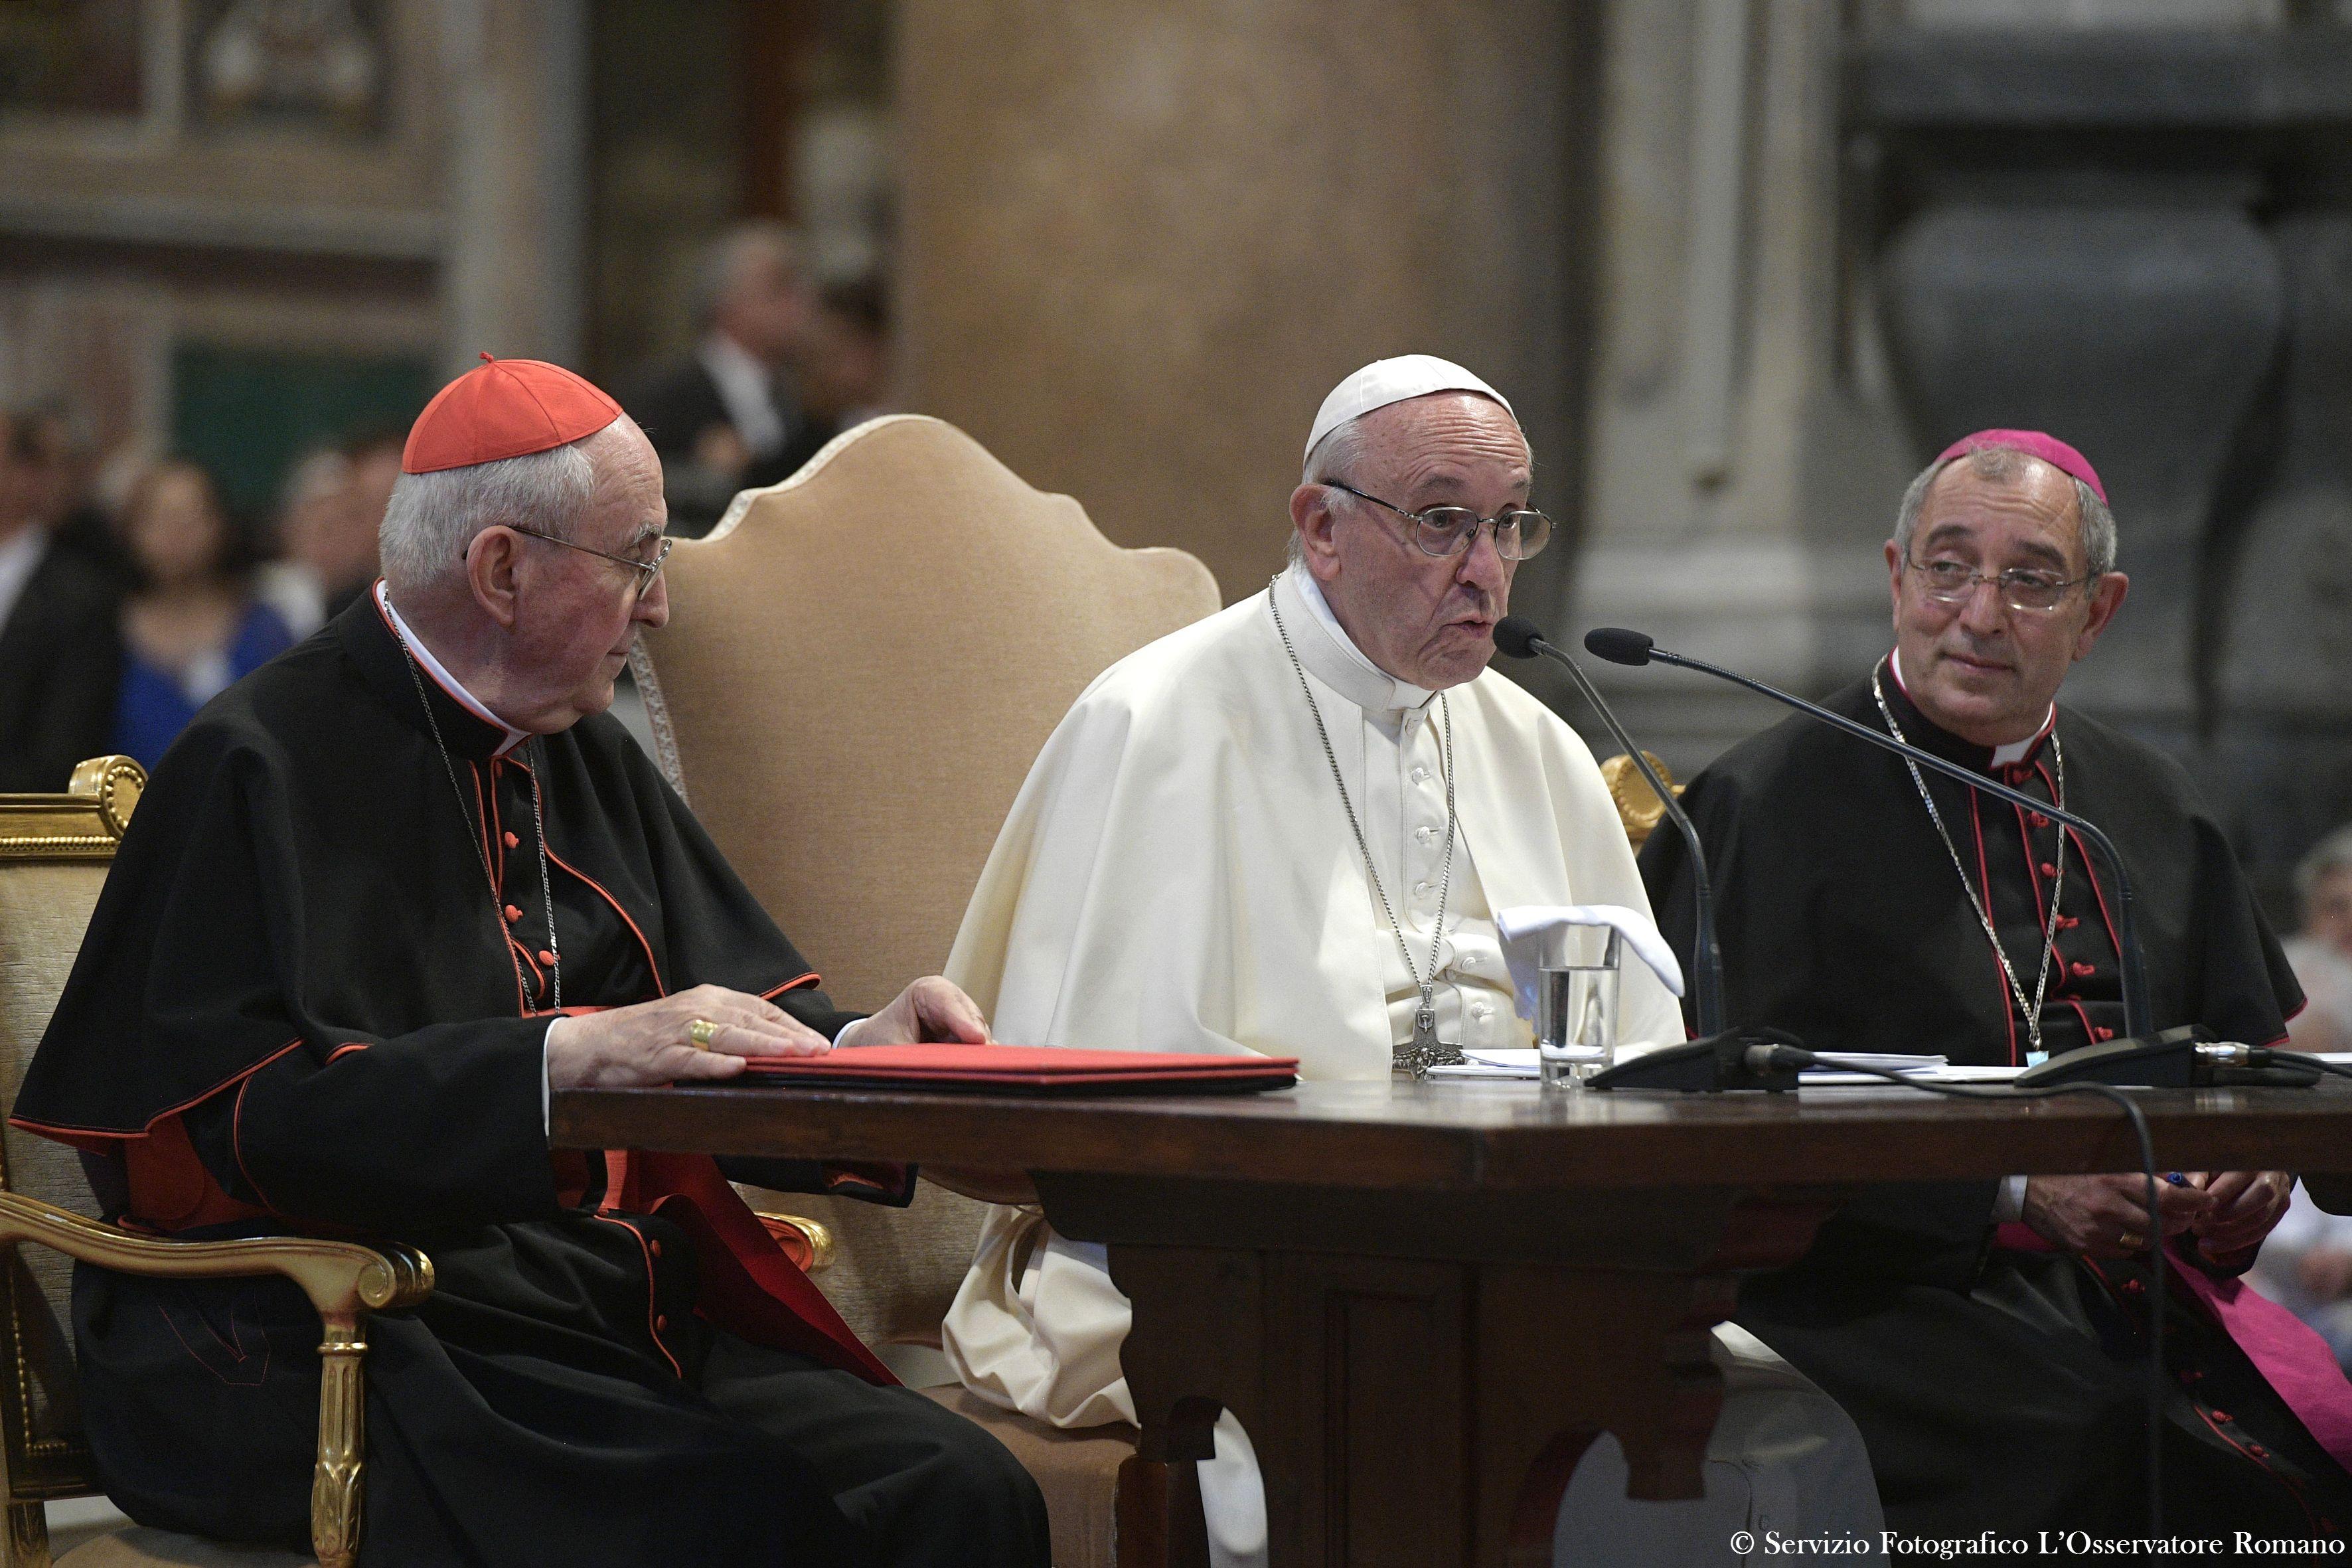 Congrès du Latran 19/06/2017 © L'Osservatore Romano